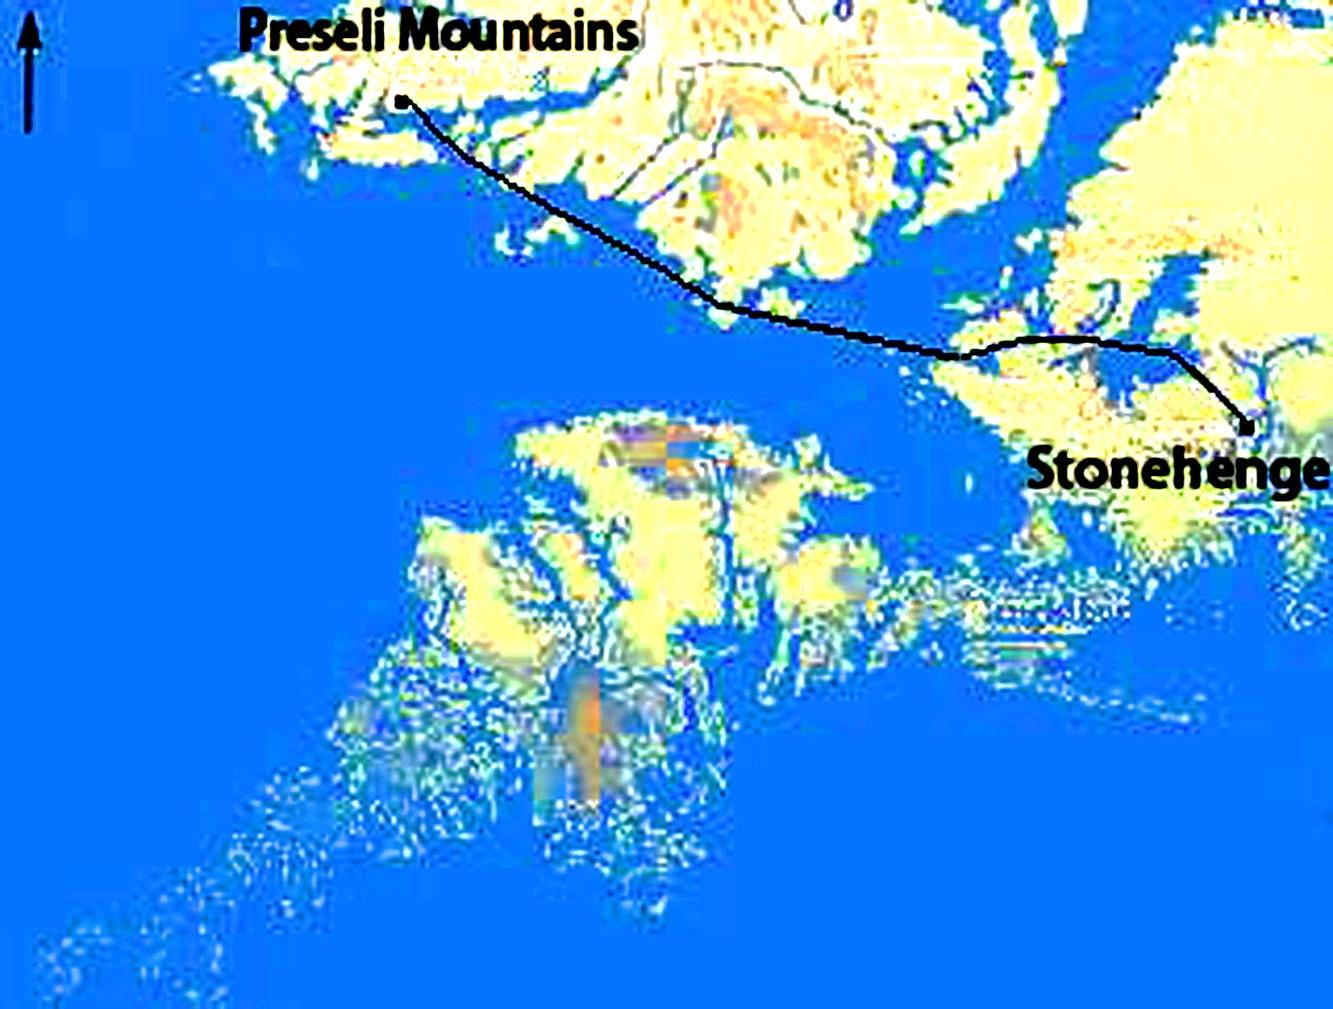 Stonehenge transport mystery solved  Tallblokes Talkshop